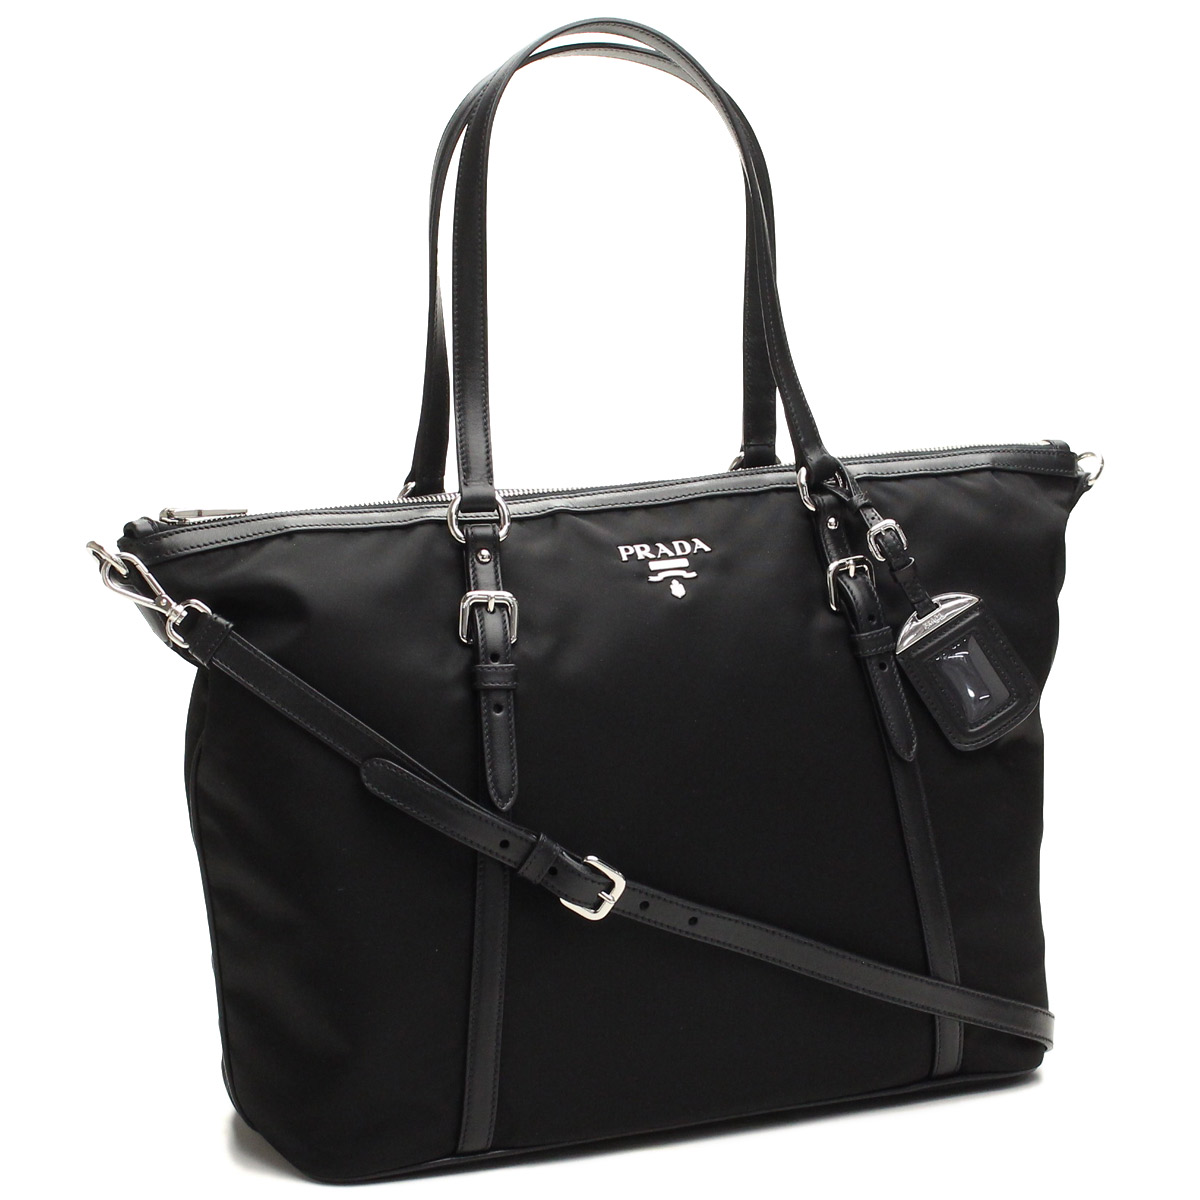 34cf073250 )Prada outlet PRADA (OUTLET) tote bag B4253M-O-QXO-F0002 NERO black(  taxfree send by EMS authentic A brand new item )